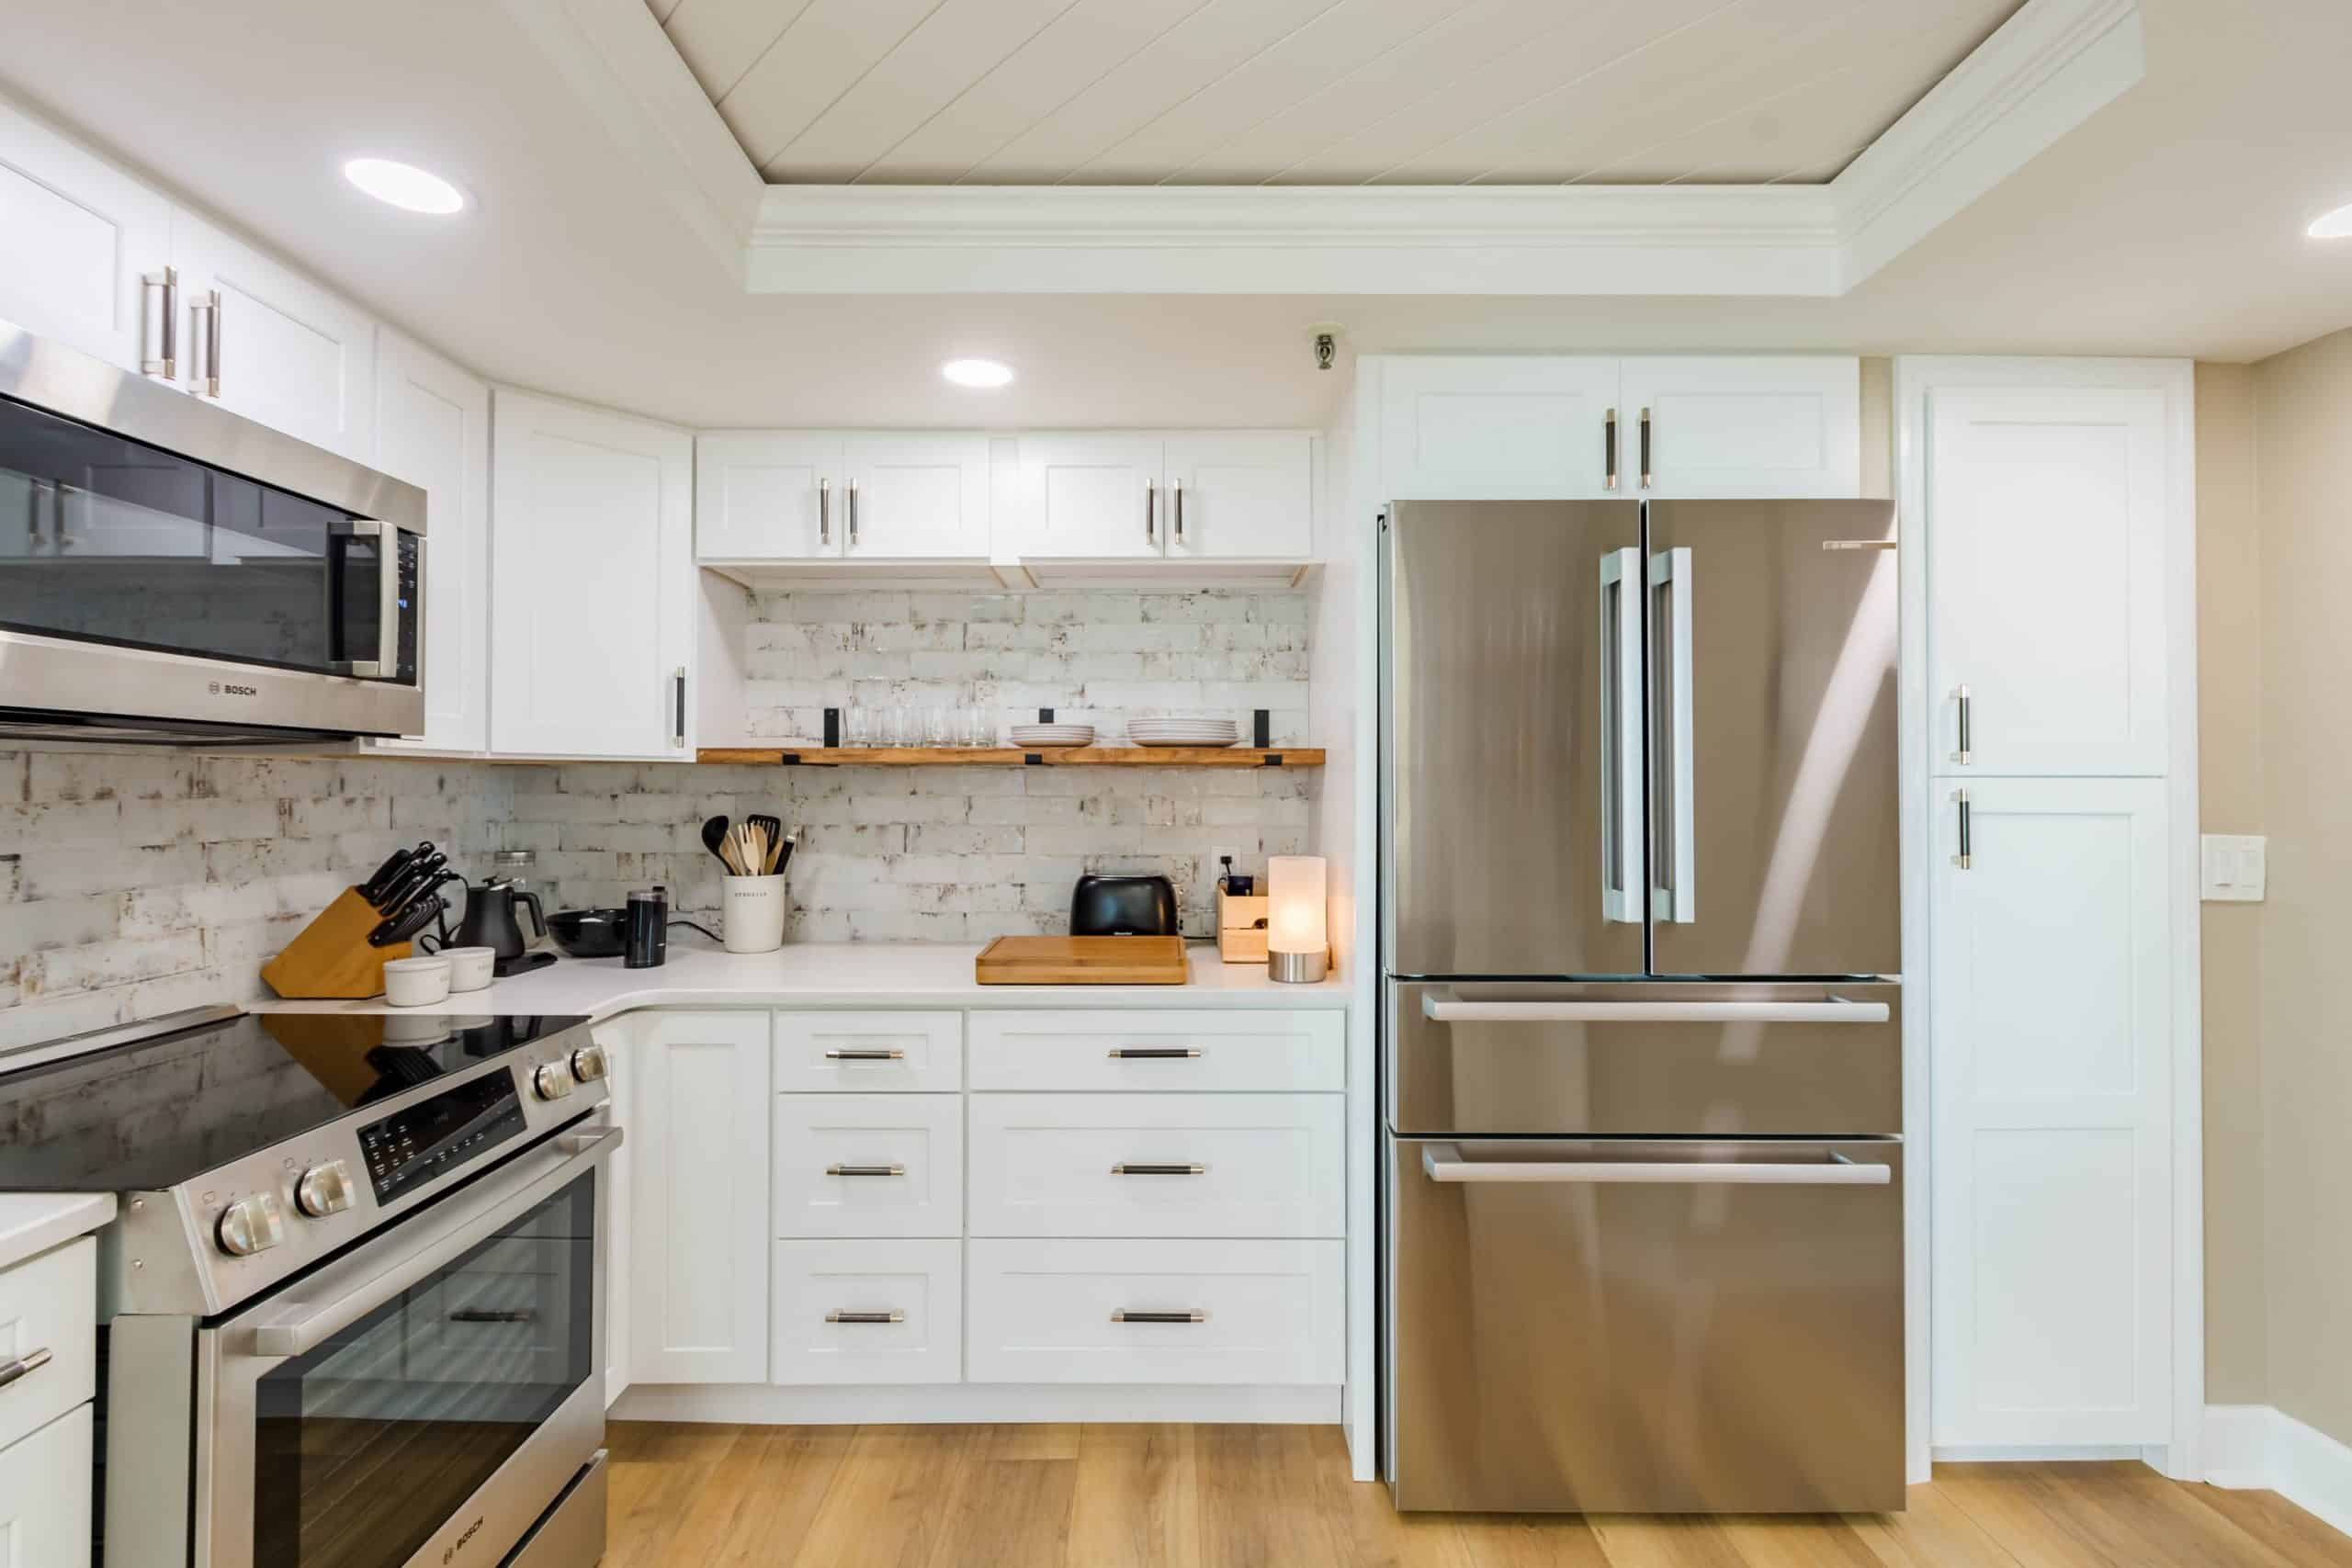 refrigerator in kitchen remodeling in Pelican Beach